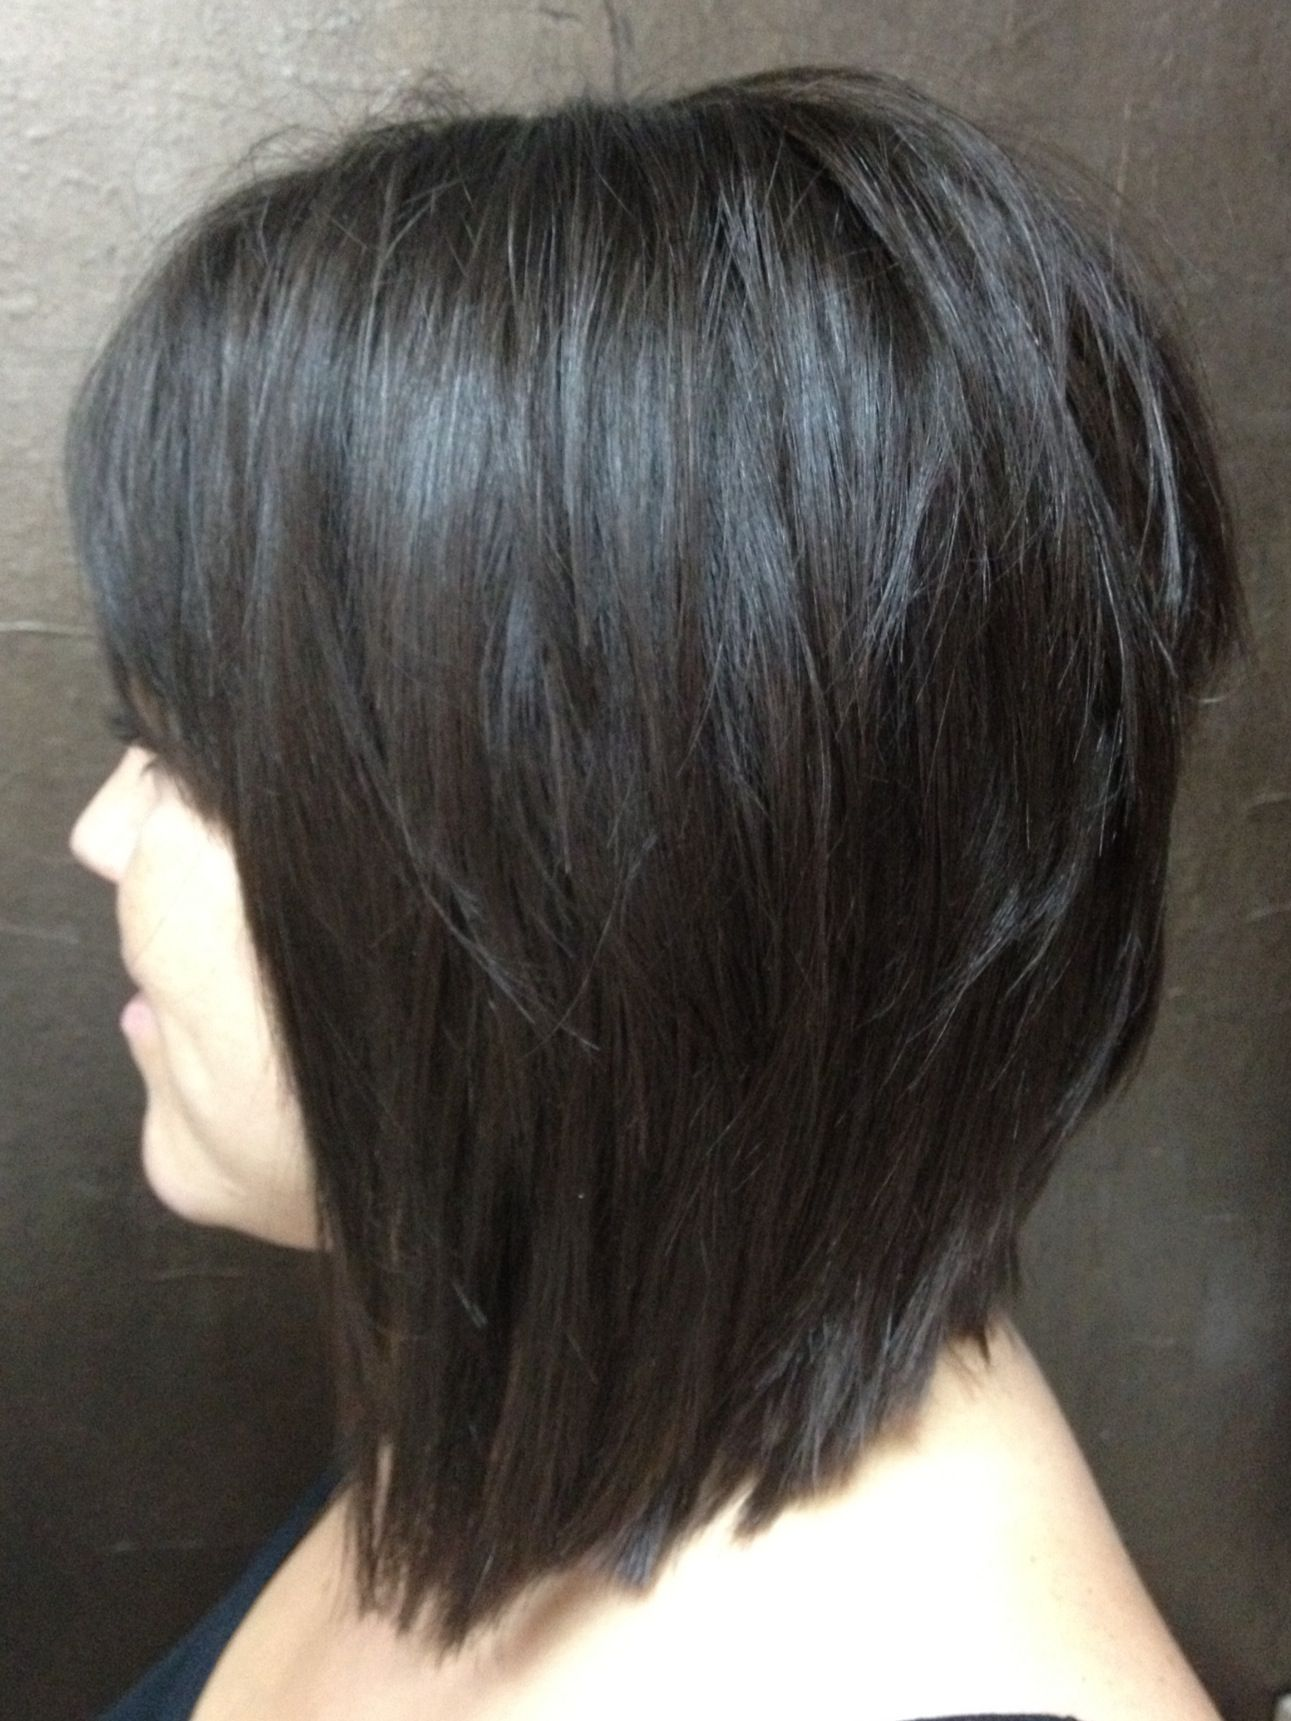 21 Amazing Inspiring Angled Bob Hairstyles We Love